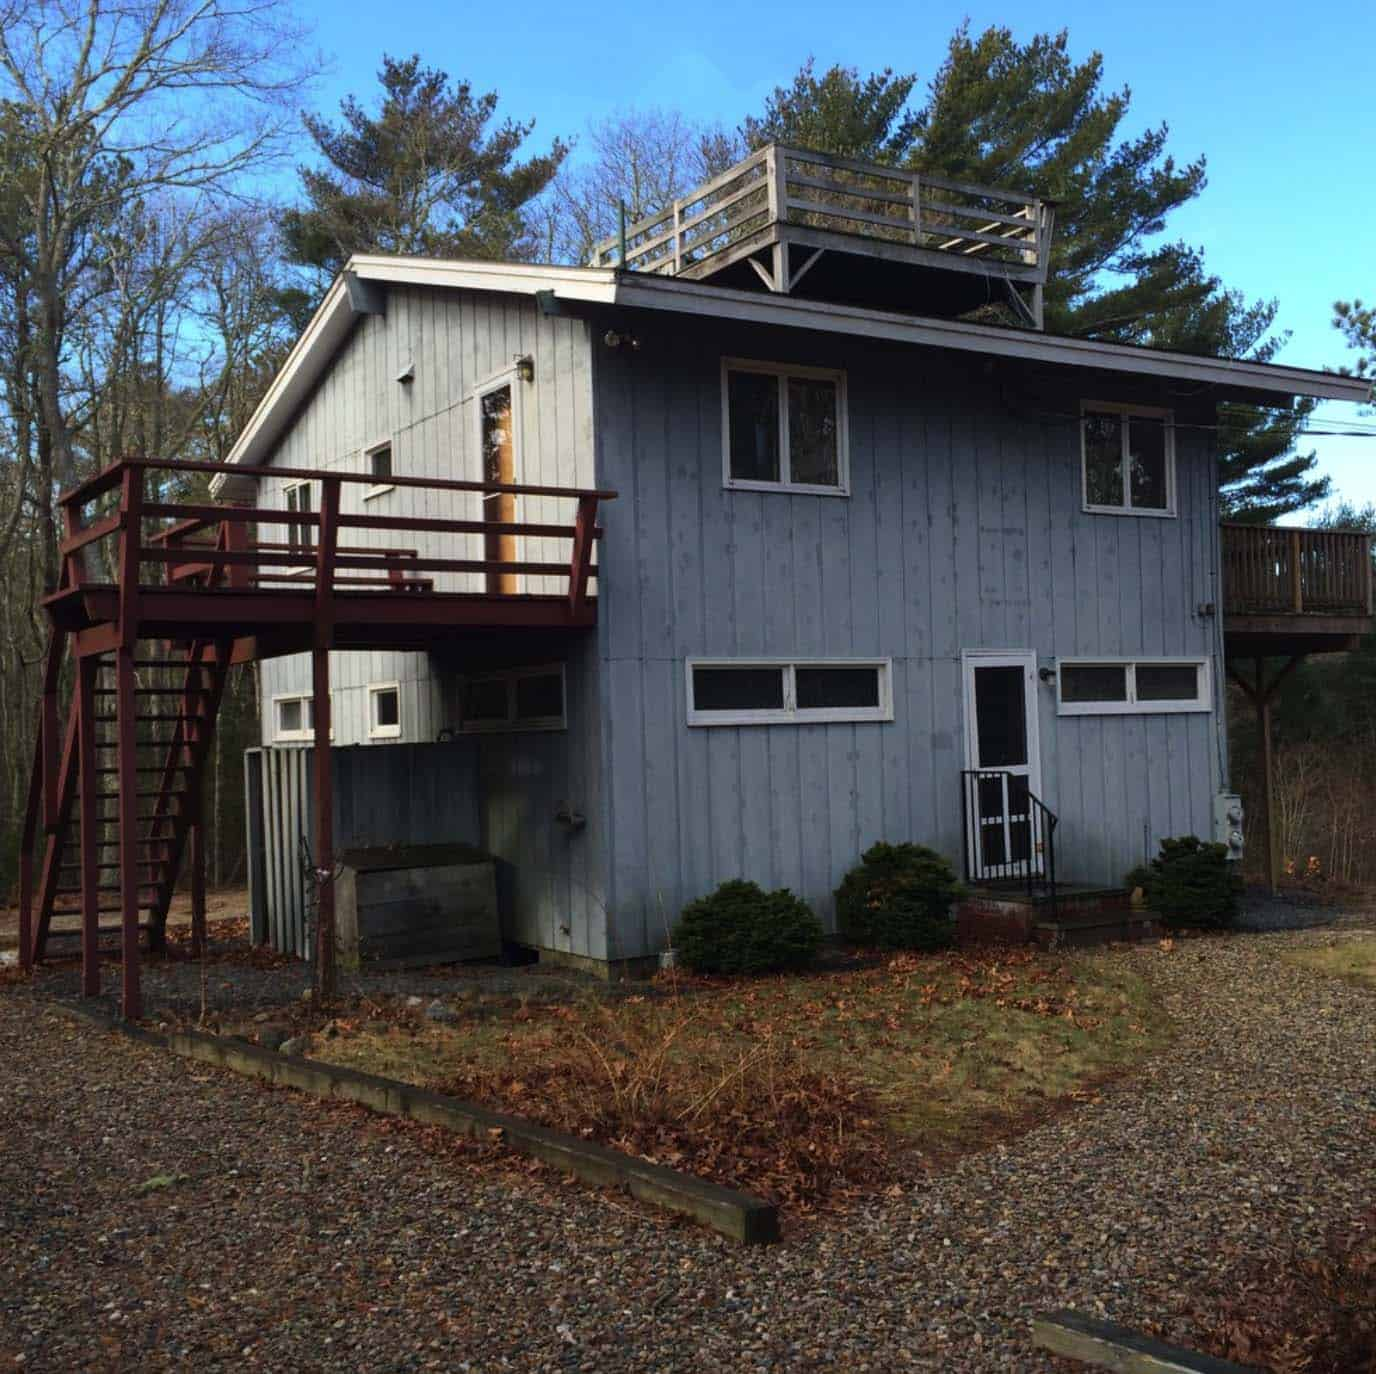 cottage-exterior-prior-to-renovation